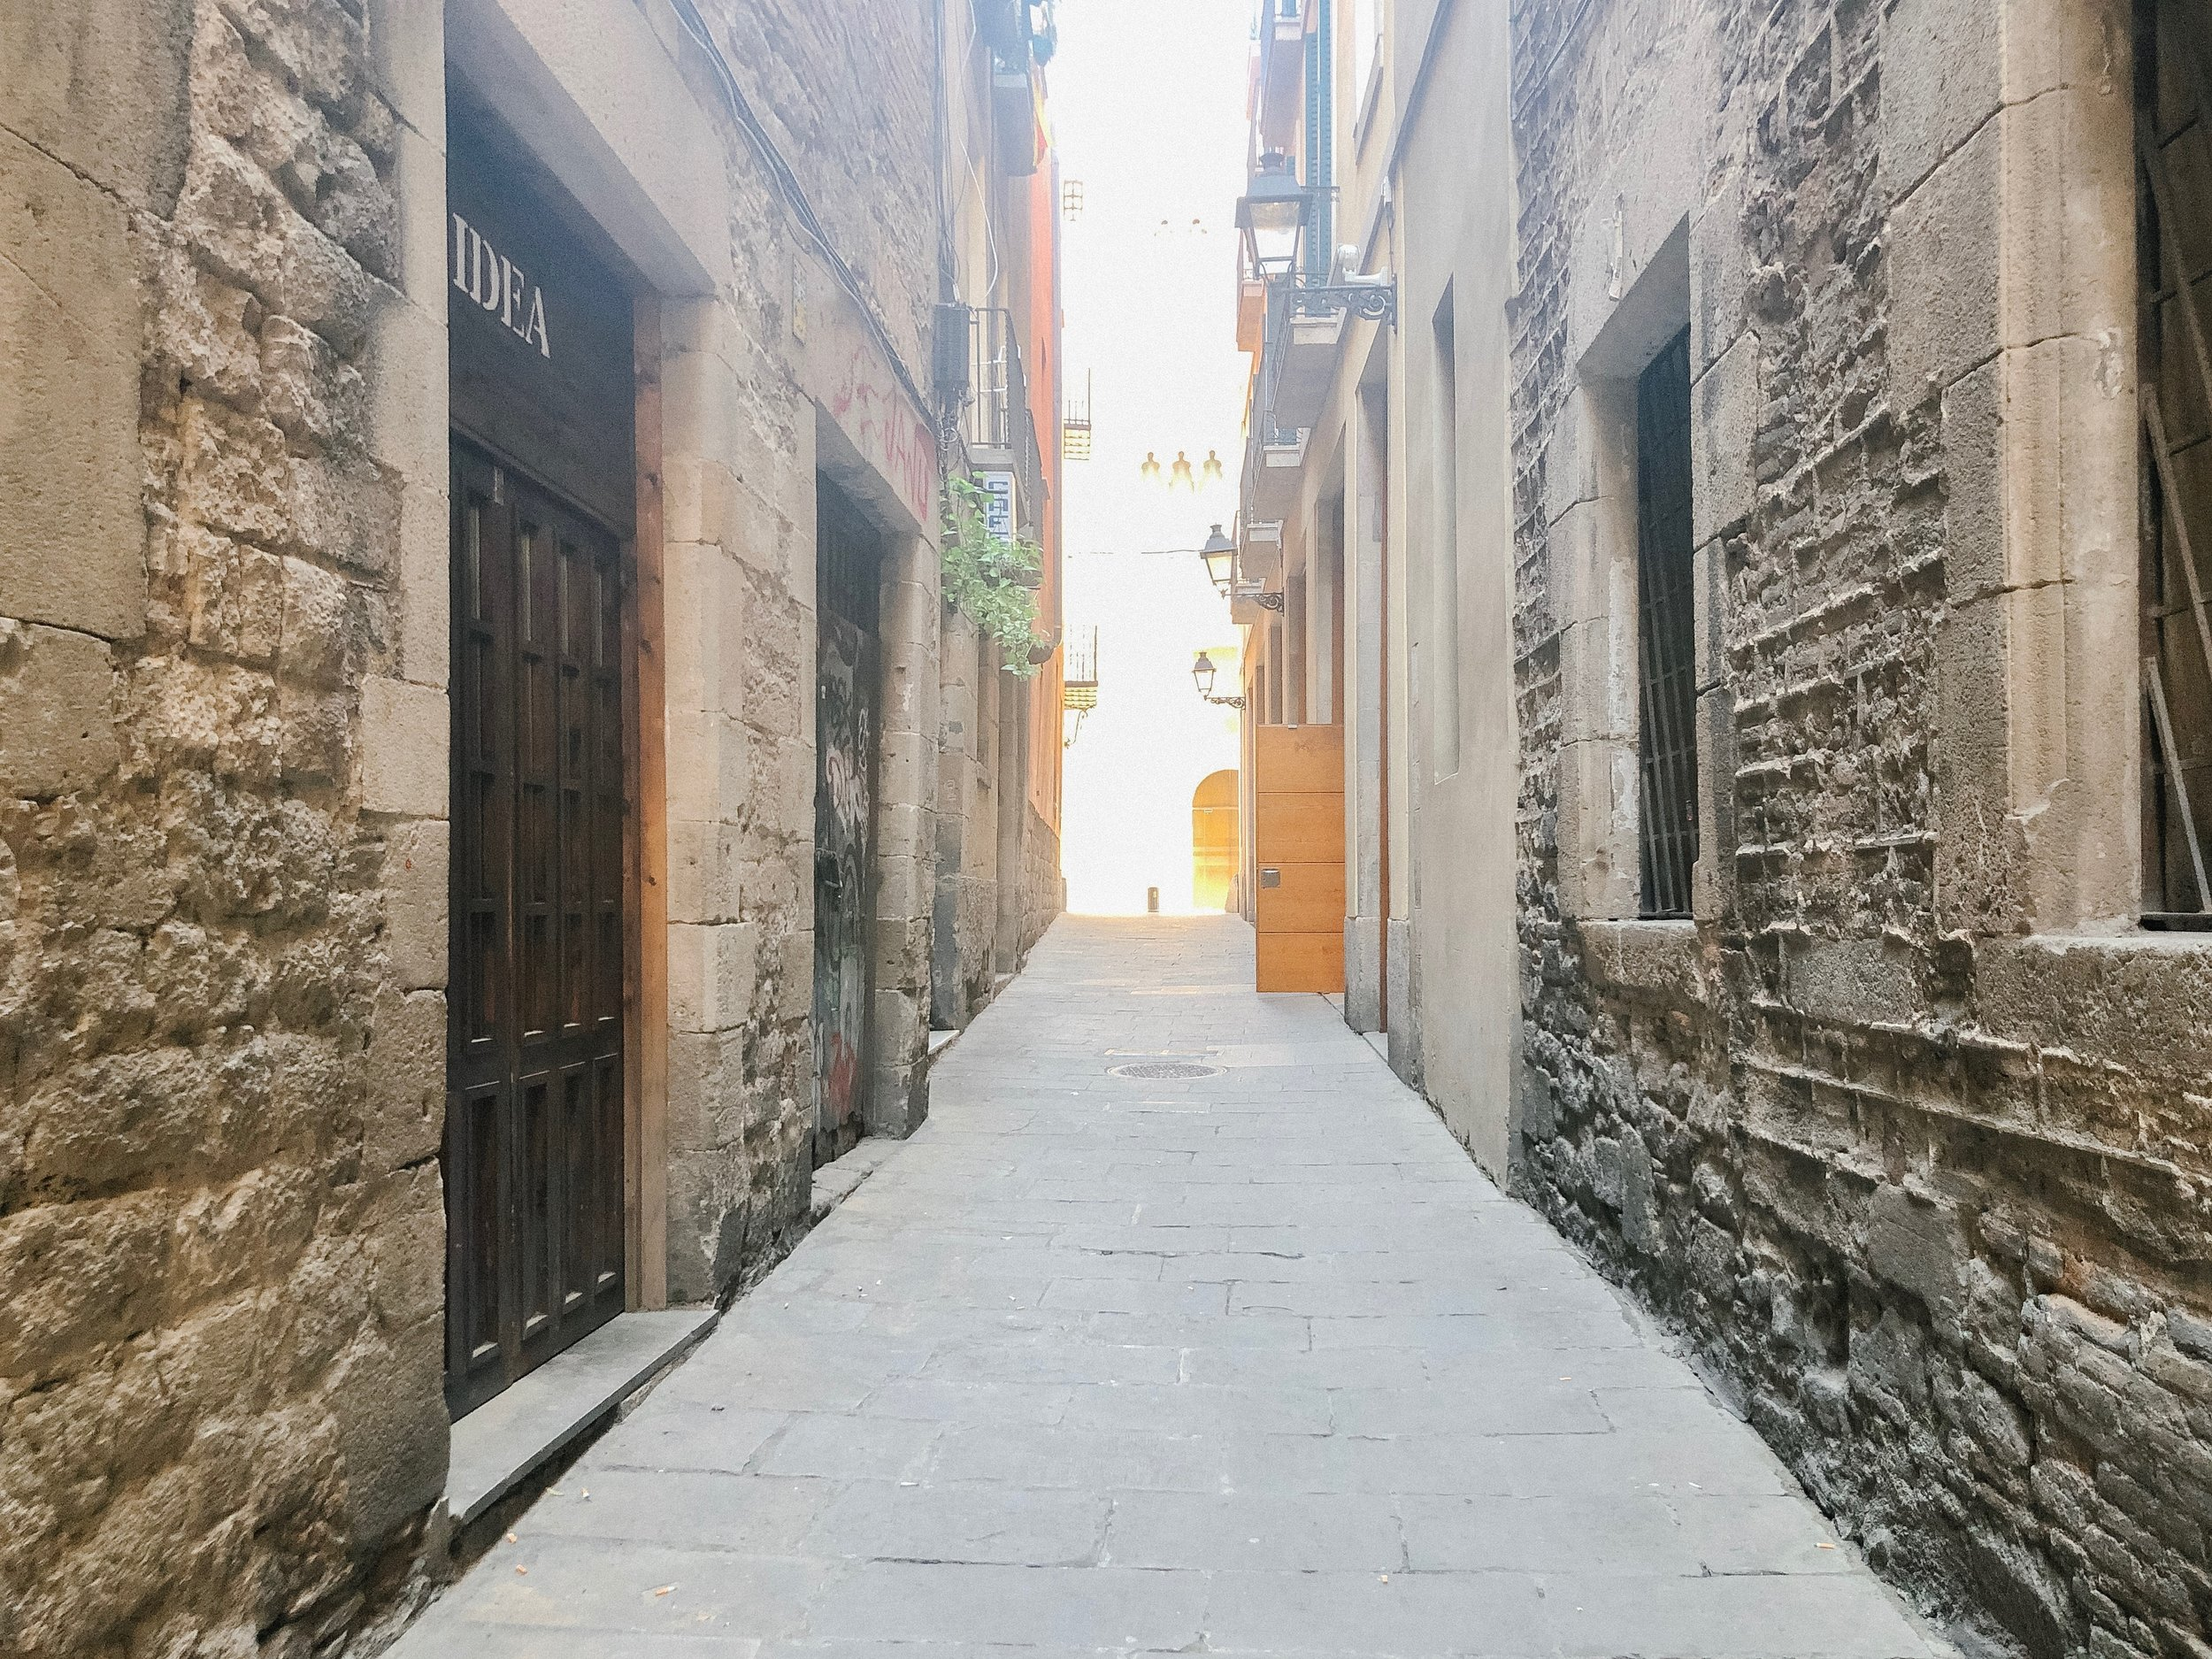 barcelona_honeymoon_travel_agent_3.jpg